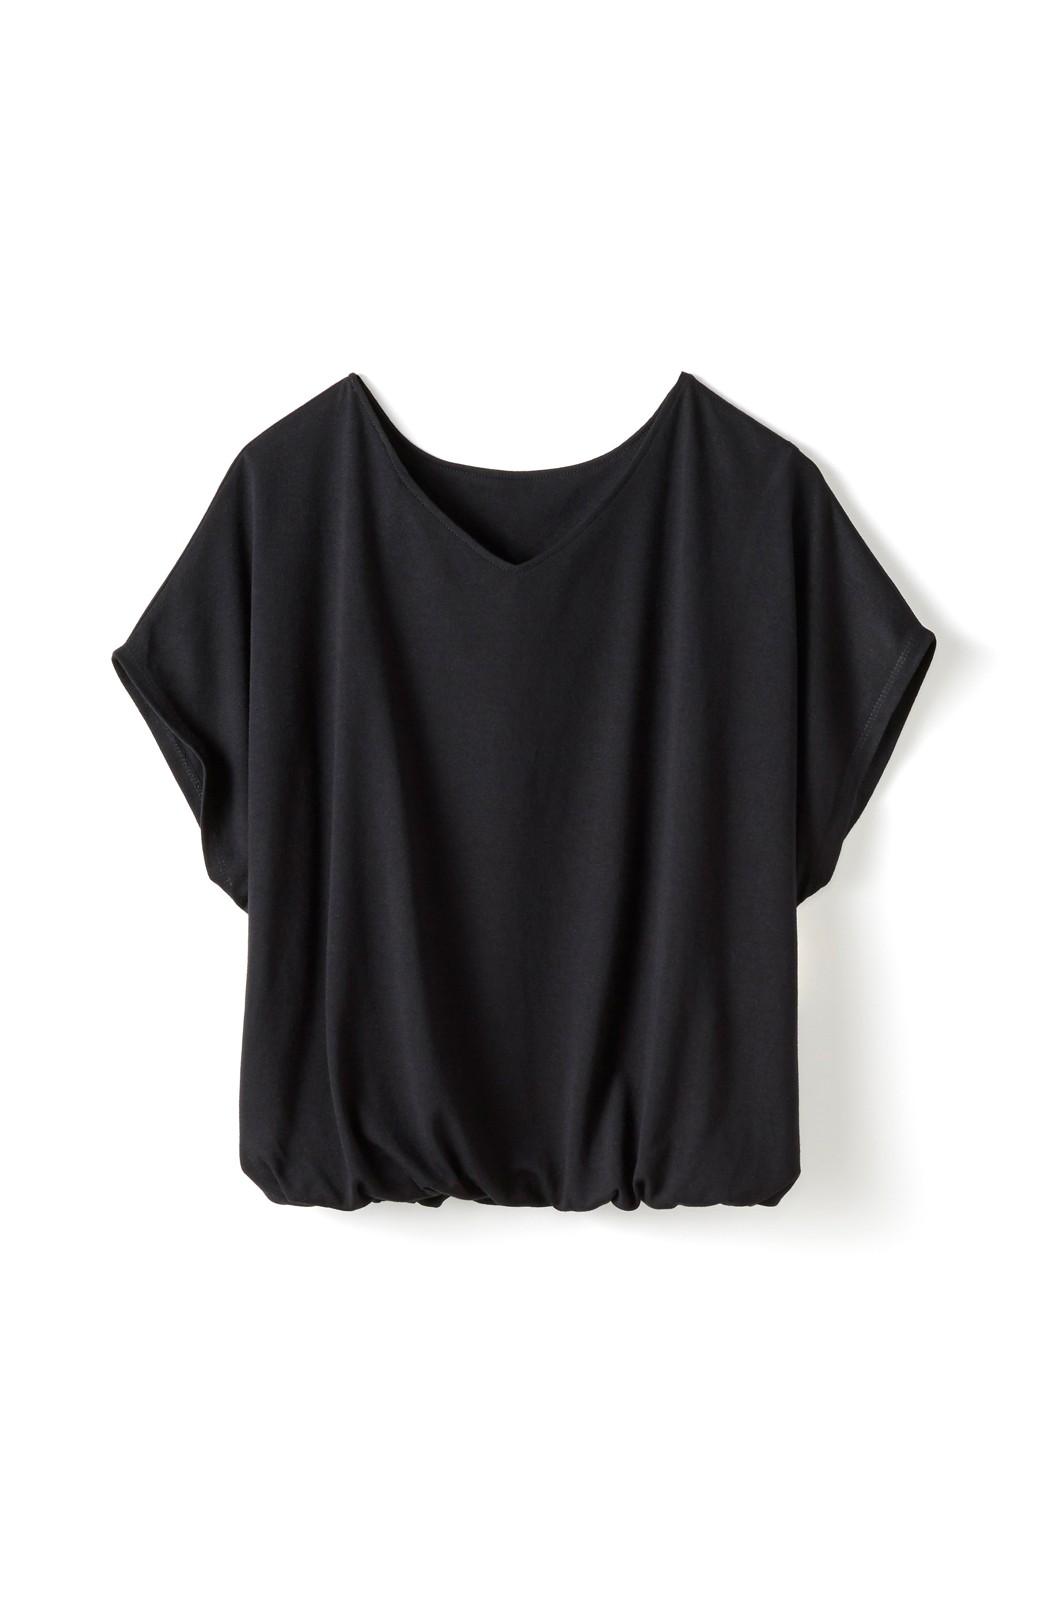 haco! 旅の救世主!3泊4日のテレコオールインワン&大人っぽTシャツセット <ブラック>の商品写真3